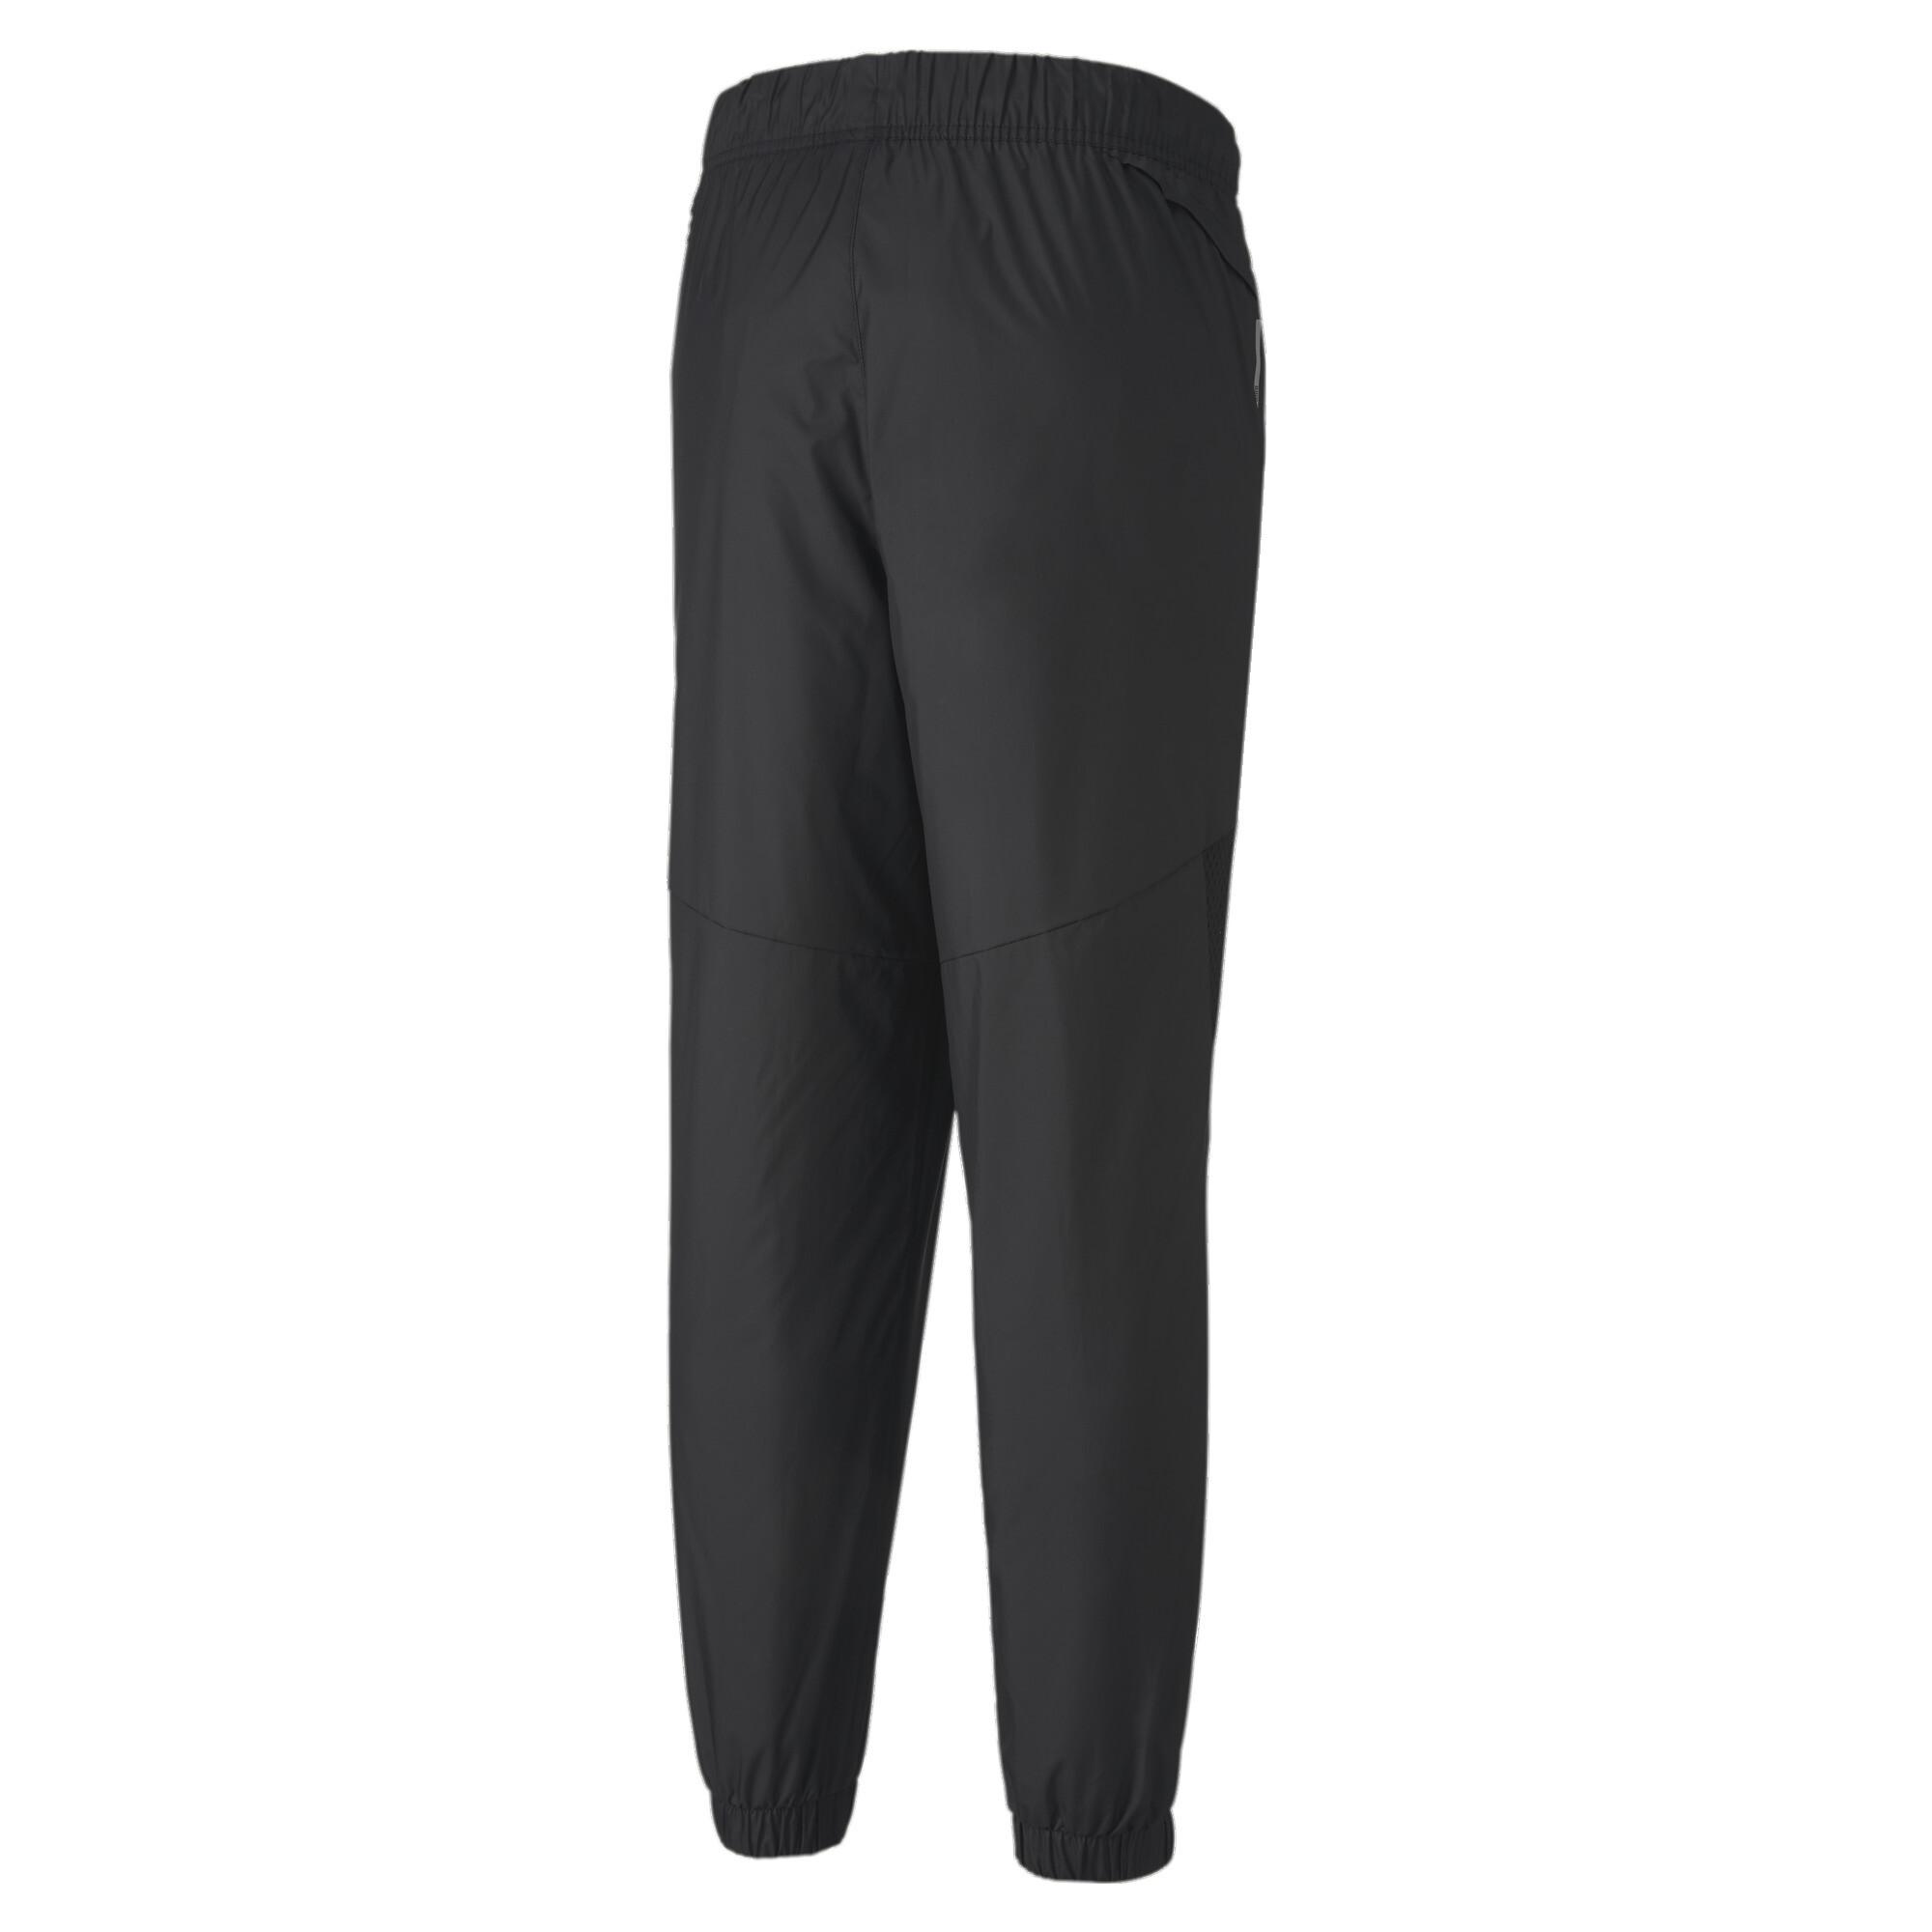 PUMA-Reactive-Men-039-s-Woven-Training-Pants-Men-Woven-Pants-Training thumbnail 3